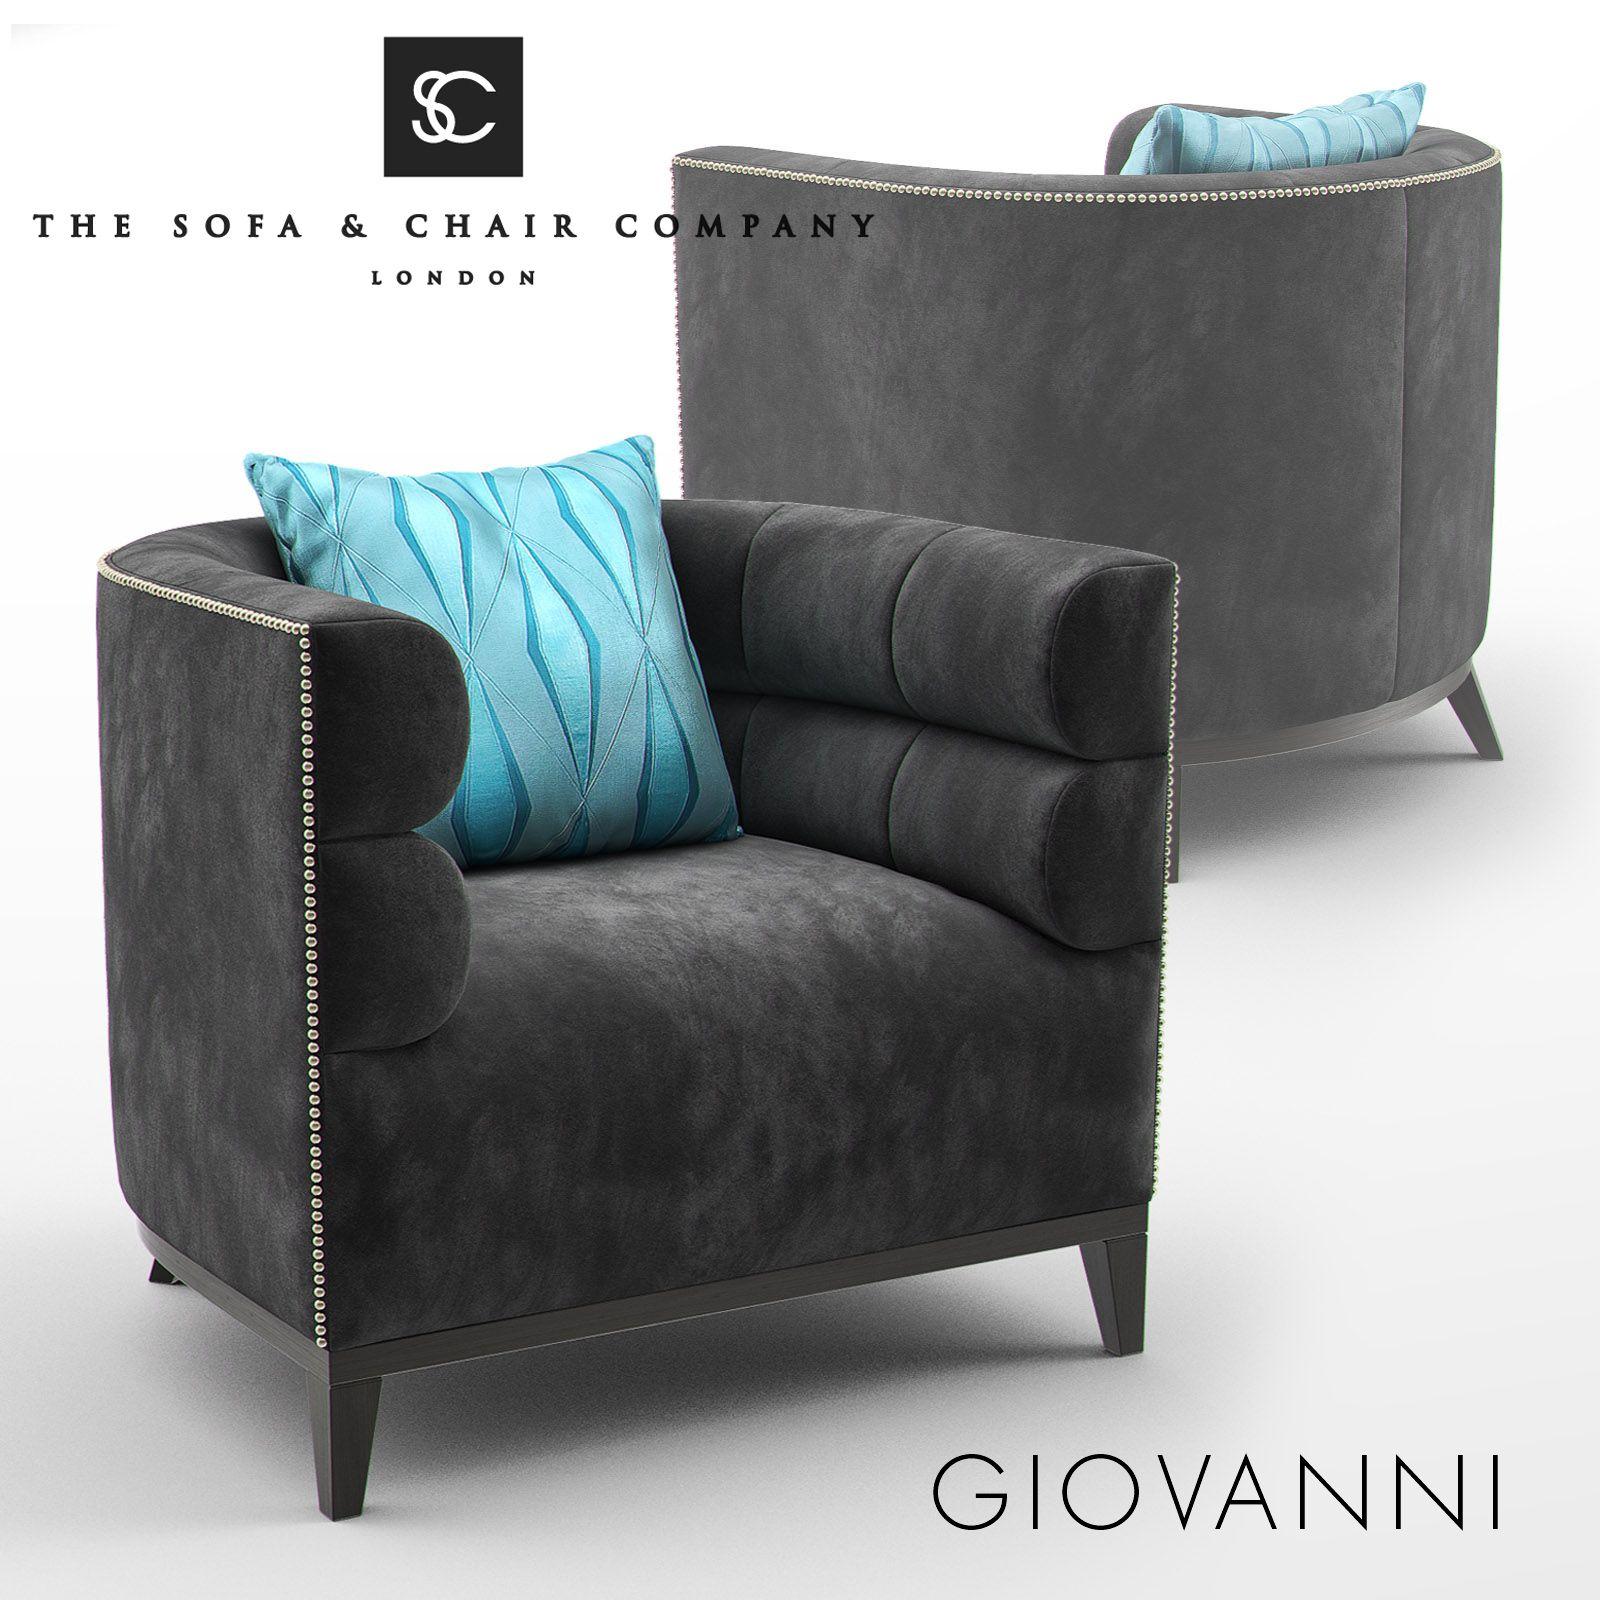 Phenomenal Giovani Occasional Armchair From The Sofa Chair Company Creativecarmelina Interior Chair Design Creativecarmelinacom